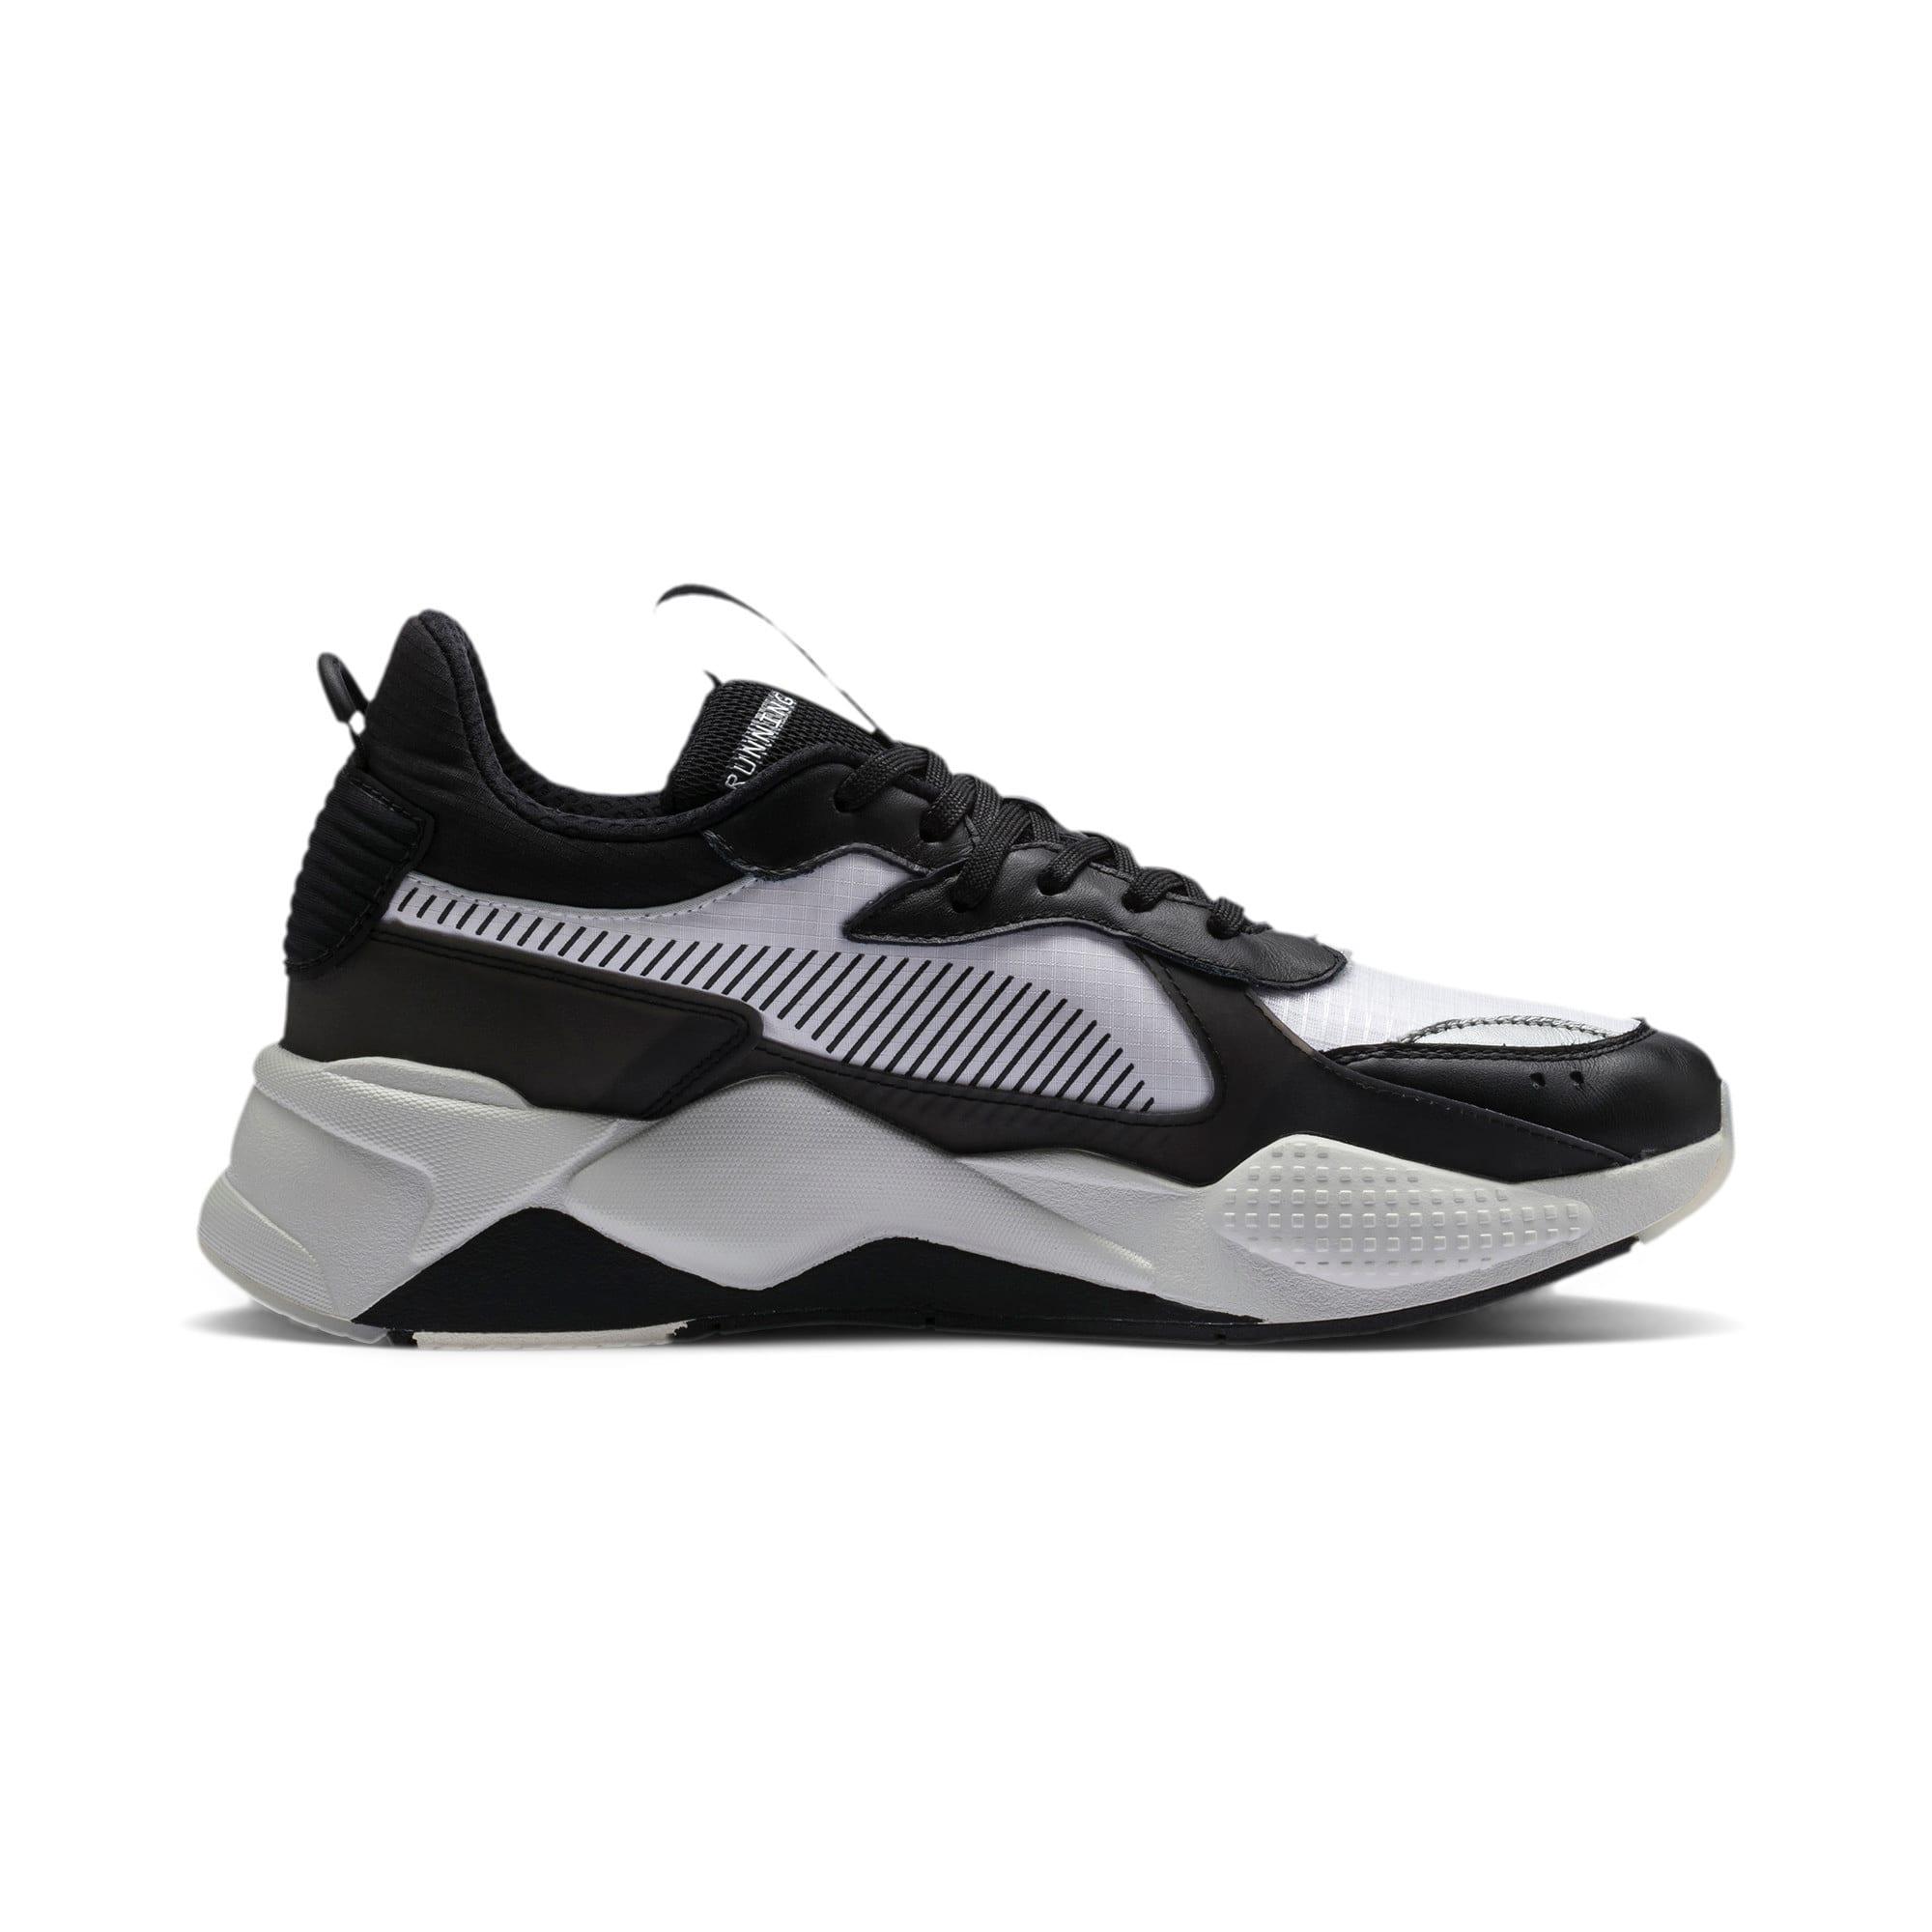 Thumbnail 6 of Basket RS-X Tech, Puma Black-Vaporous Gray, medium